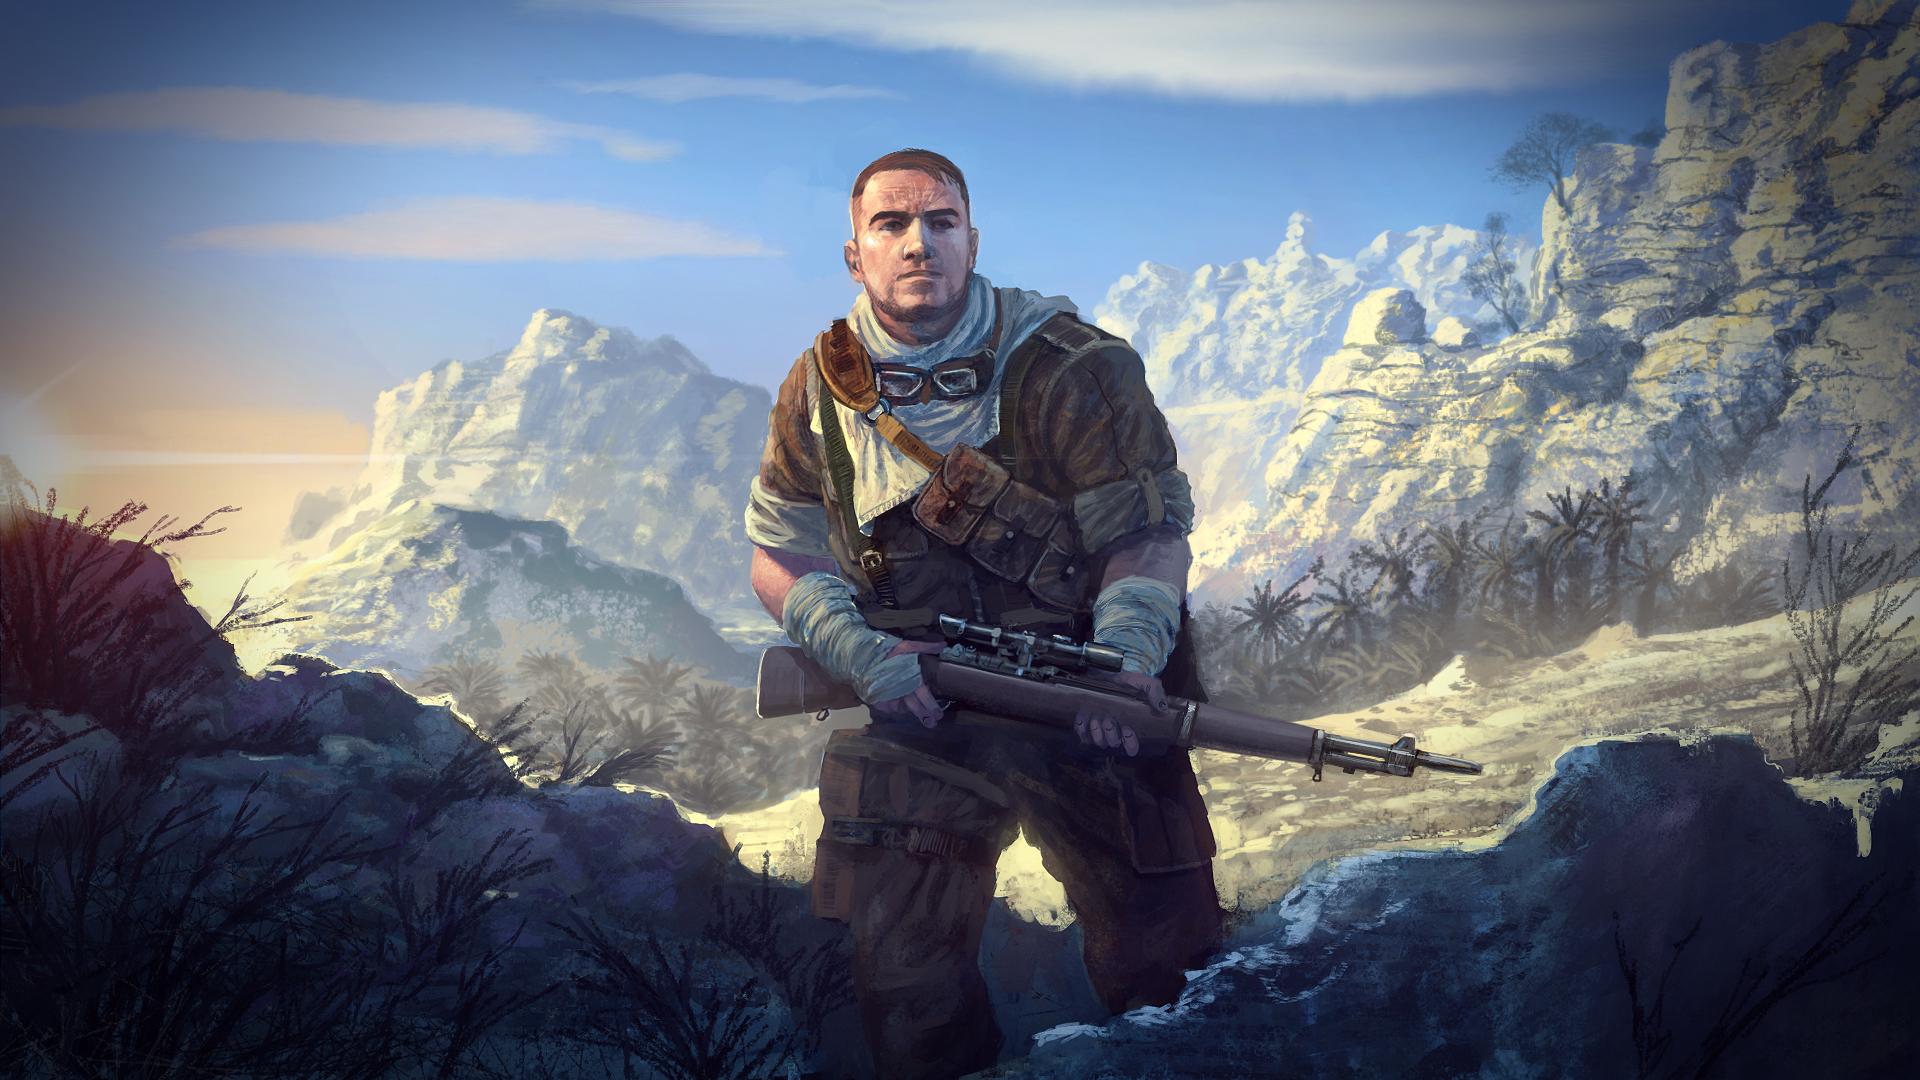 Sniper Elite 3 Wallpaper: Image - Sniper Elite 3 Artwork 8.jpg